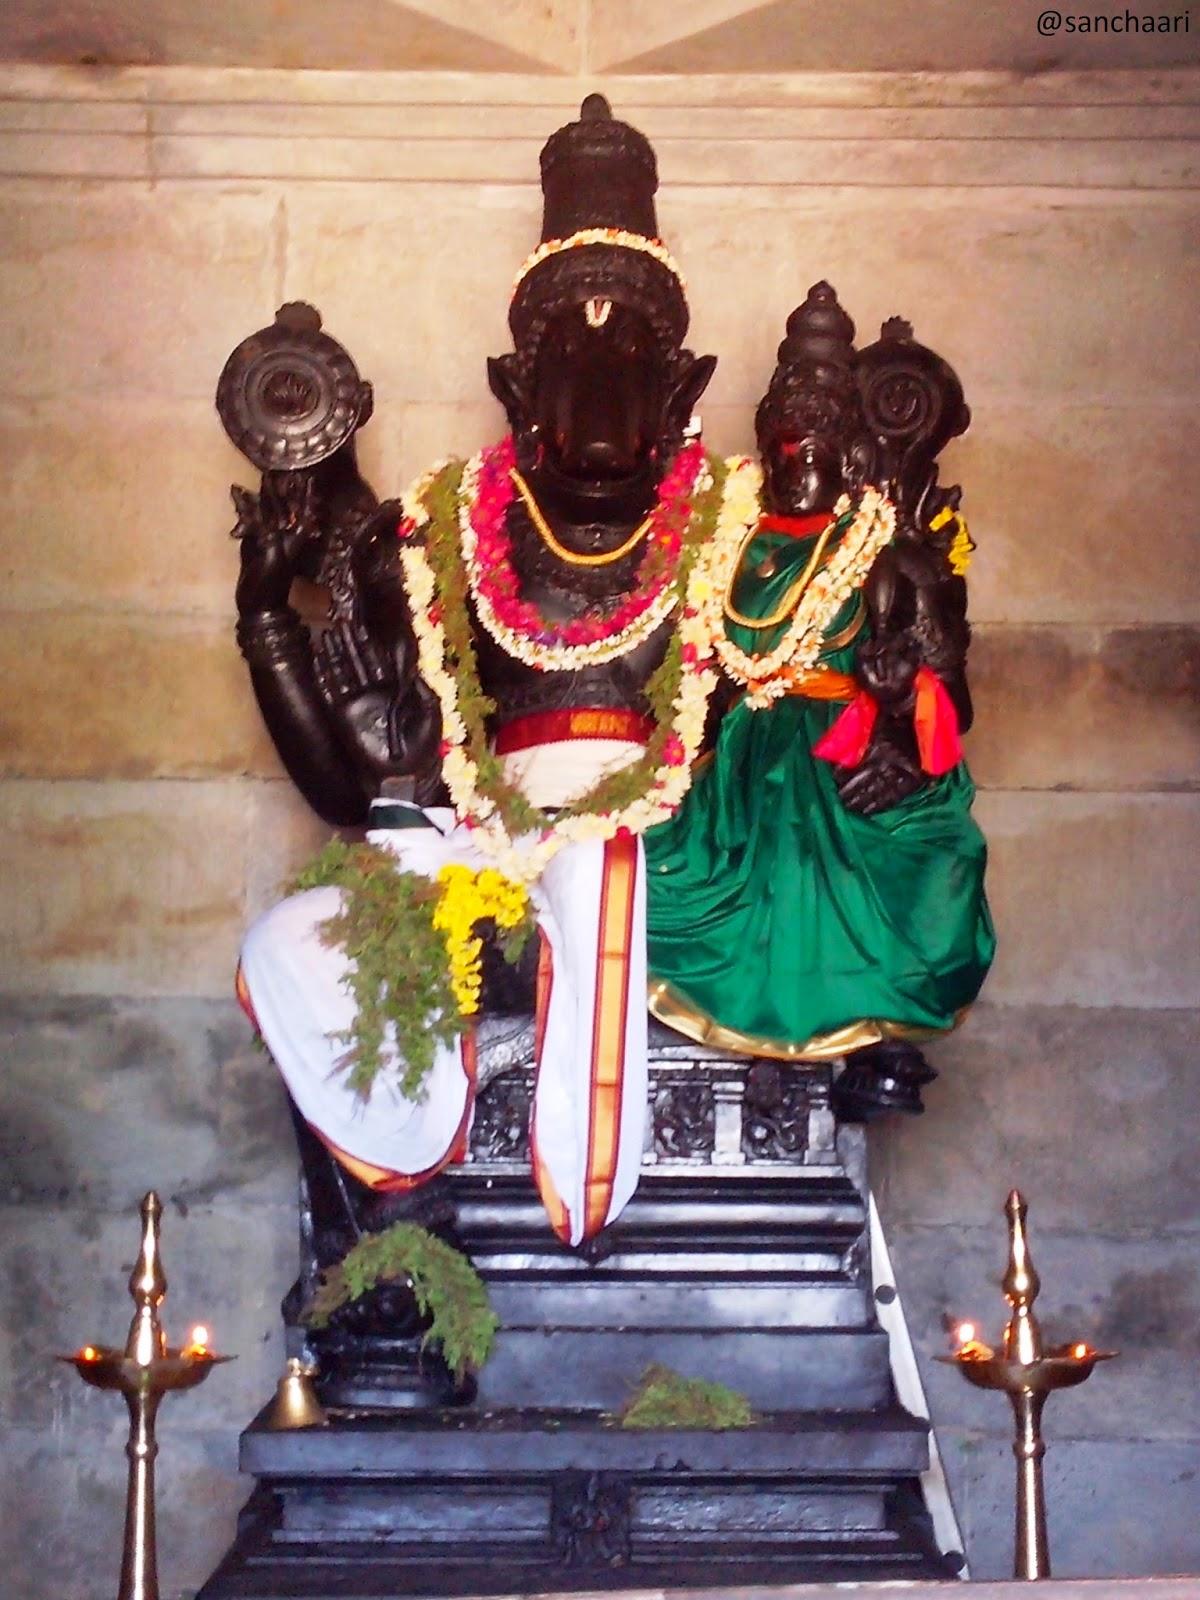 bhoo varahaswamy temple in bangalore dating